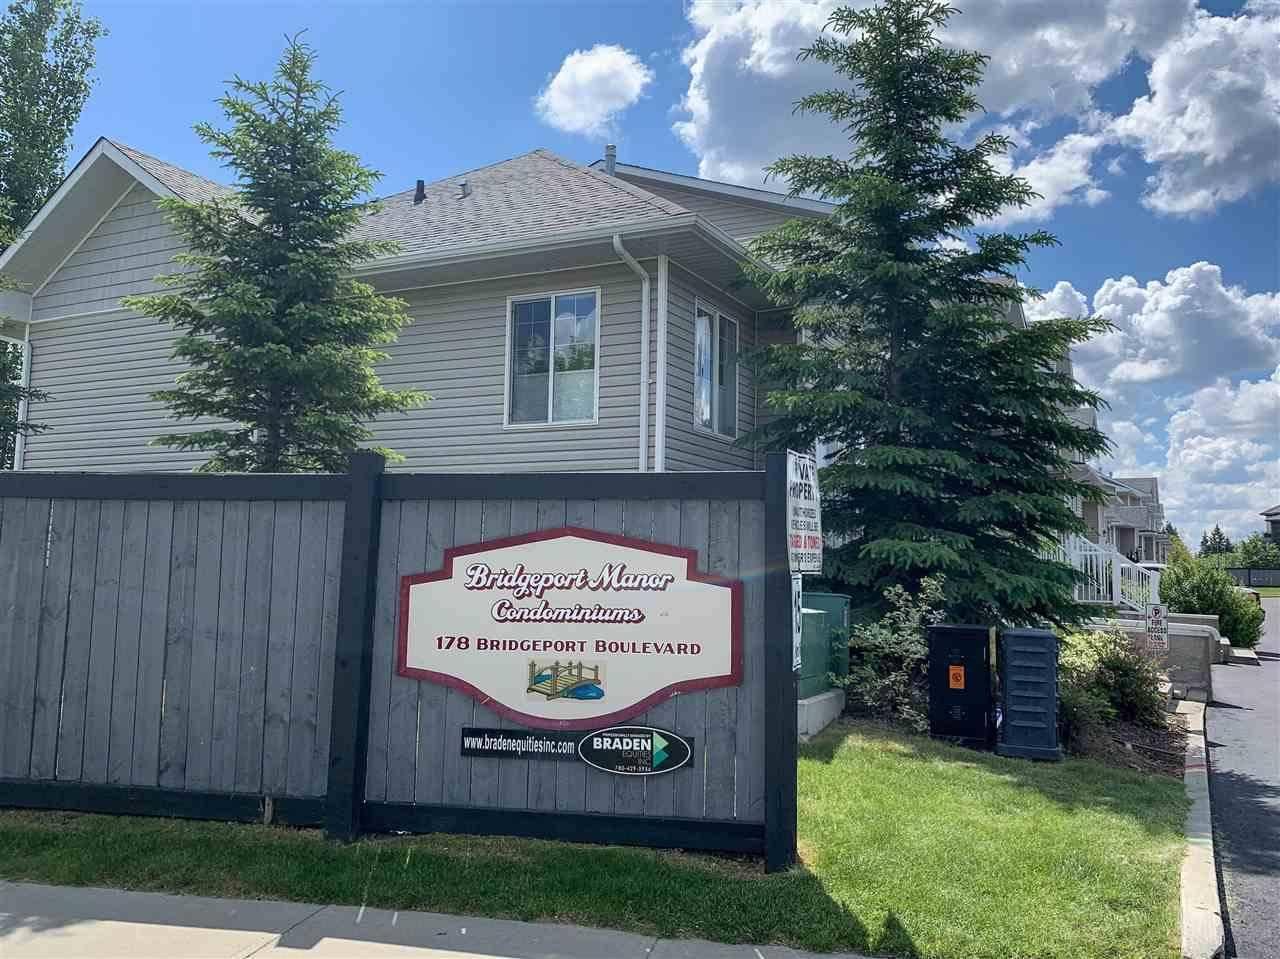 Townhouse for sale at 178 Bridgeport Blvd Unit 102 Leduc Alberta - MLS: E4155525